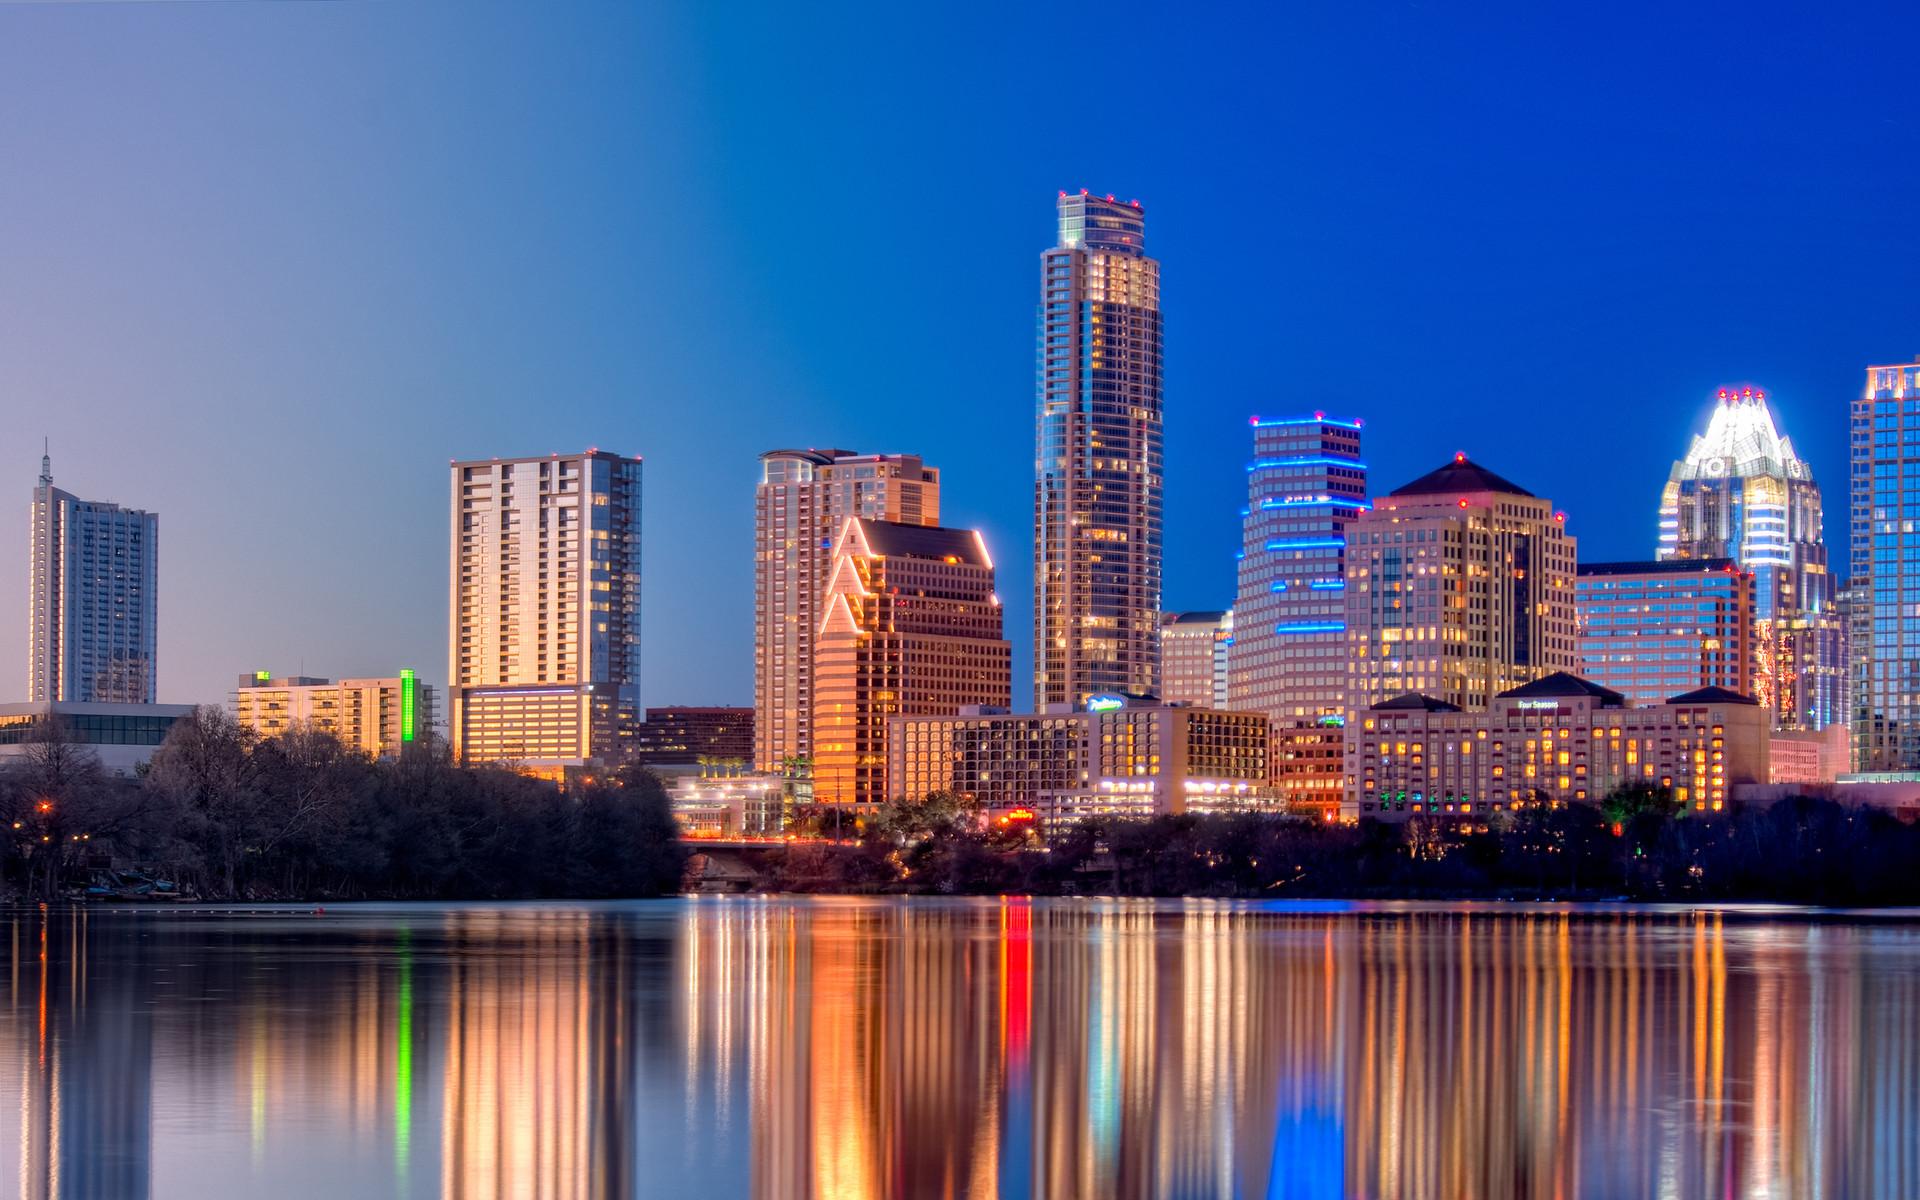 Austin, Texas Computer Wallpapers, Desktop Backgrounds | .